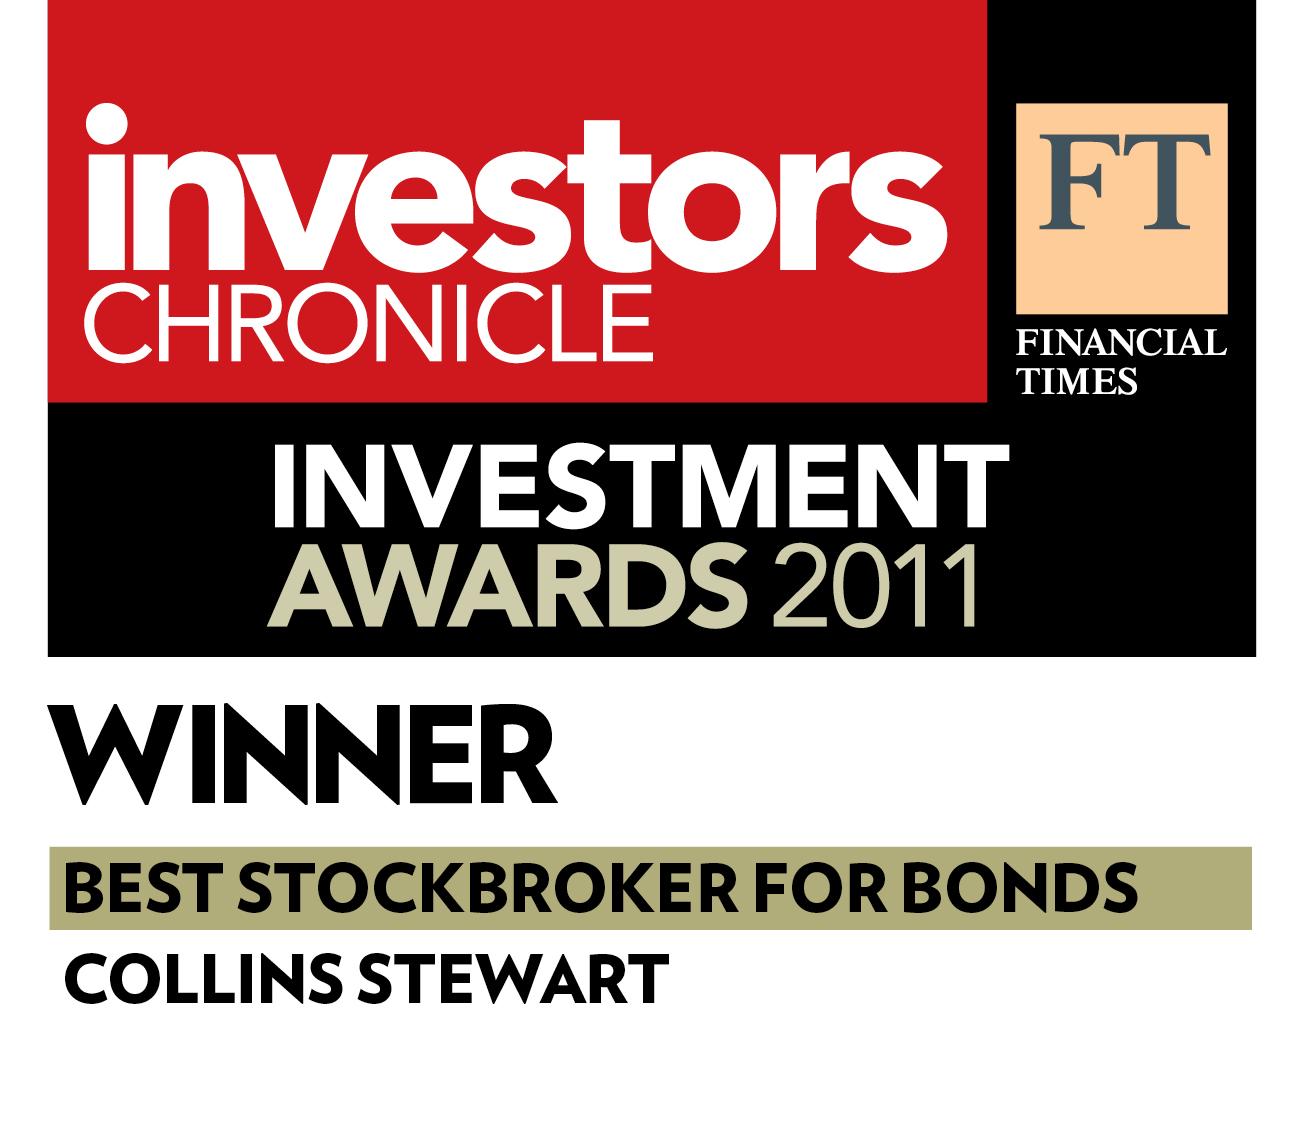 Best us broker for international investors